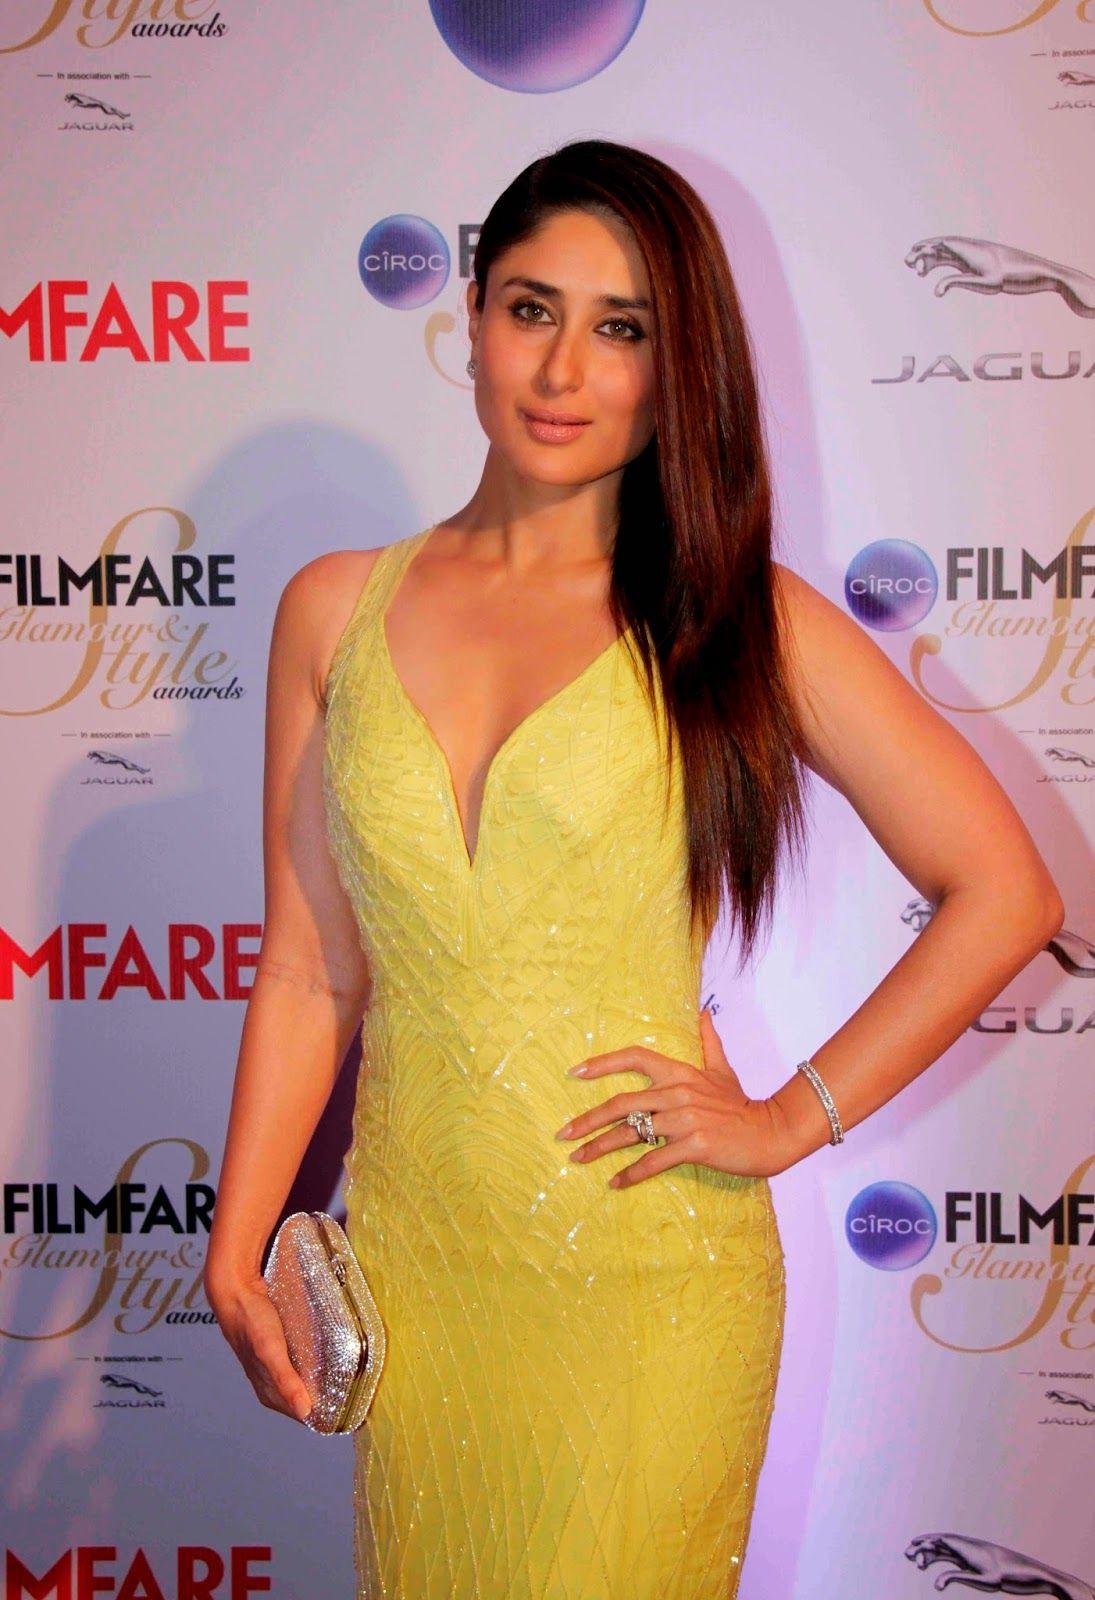 Kareena Kapoor Latest Spicy Hot Photos In Yellow Dress Lakme Fashion Week Glamour Kareena Kapoor Photos